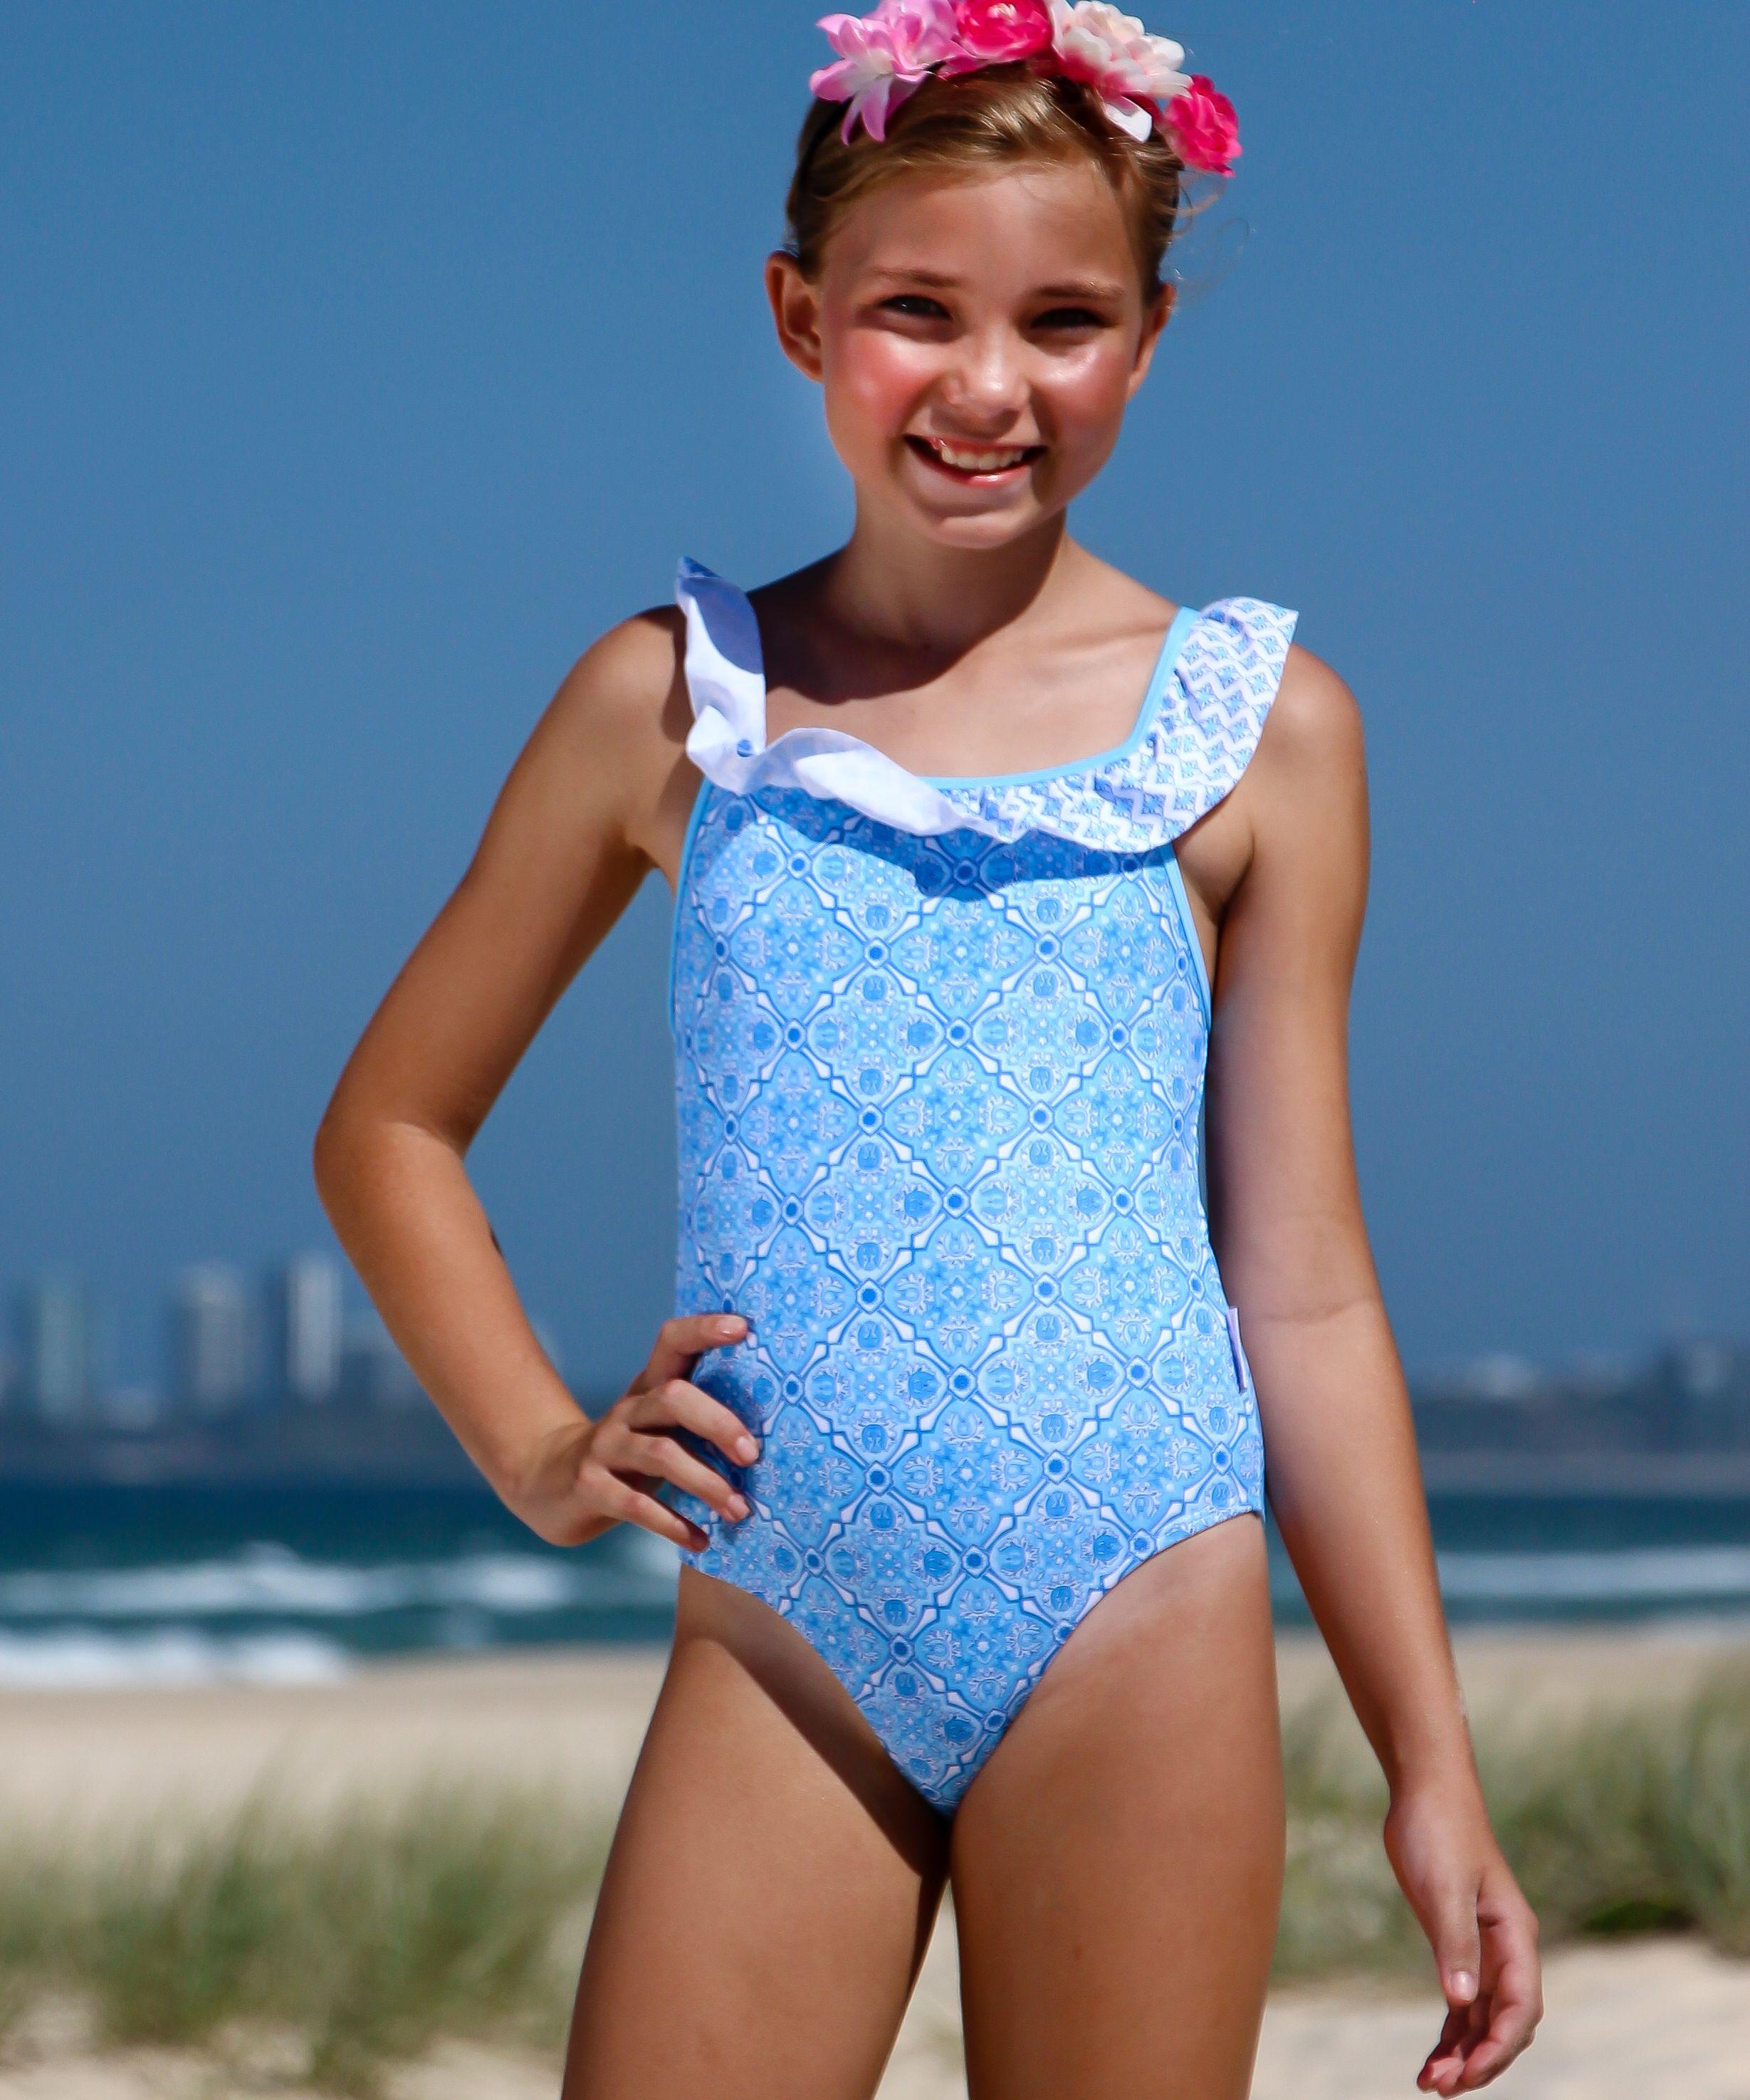 e120d86065a5 Girls Swimsuit with Frills - Swimwear  kids  kidsswimwear  summer  swimsuits